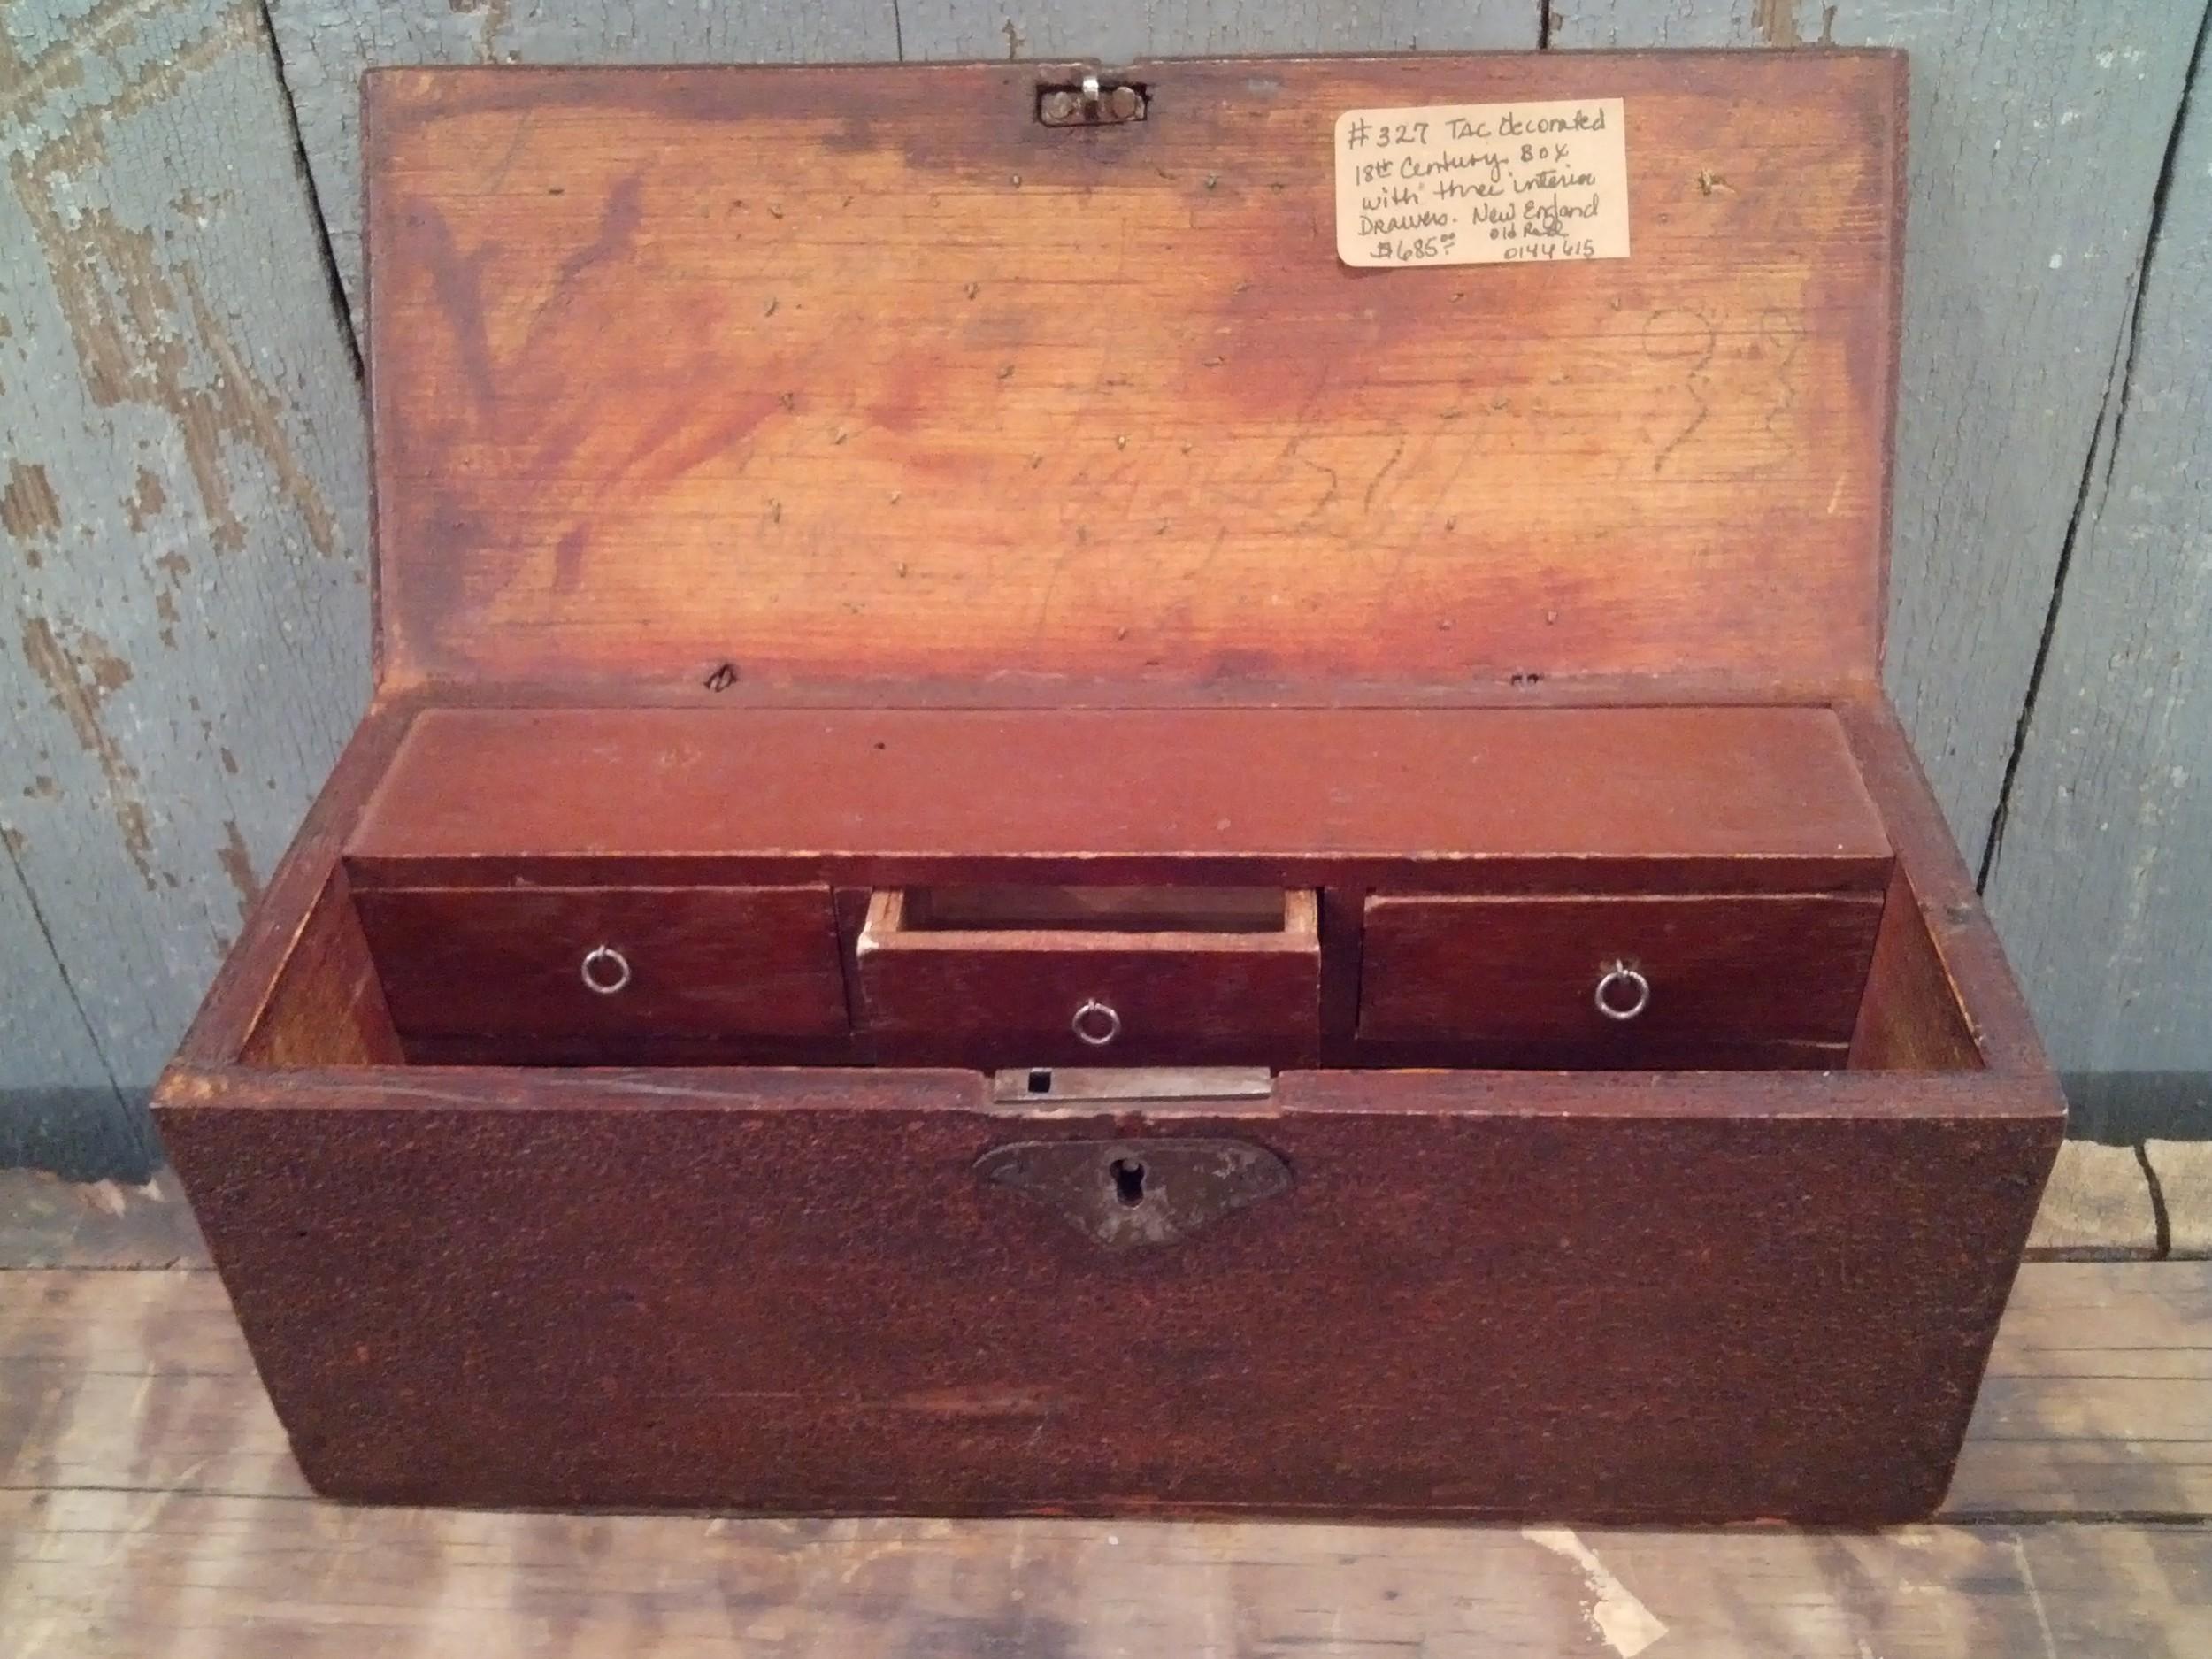 Document box inside